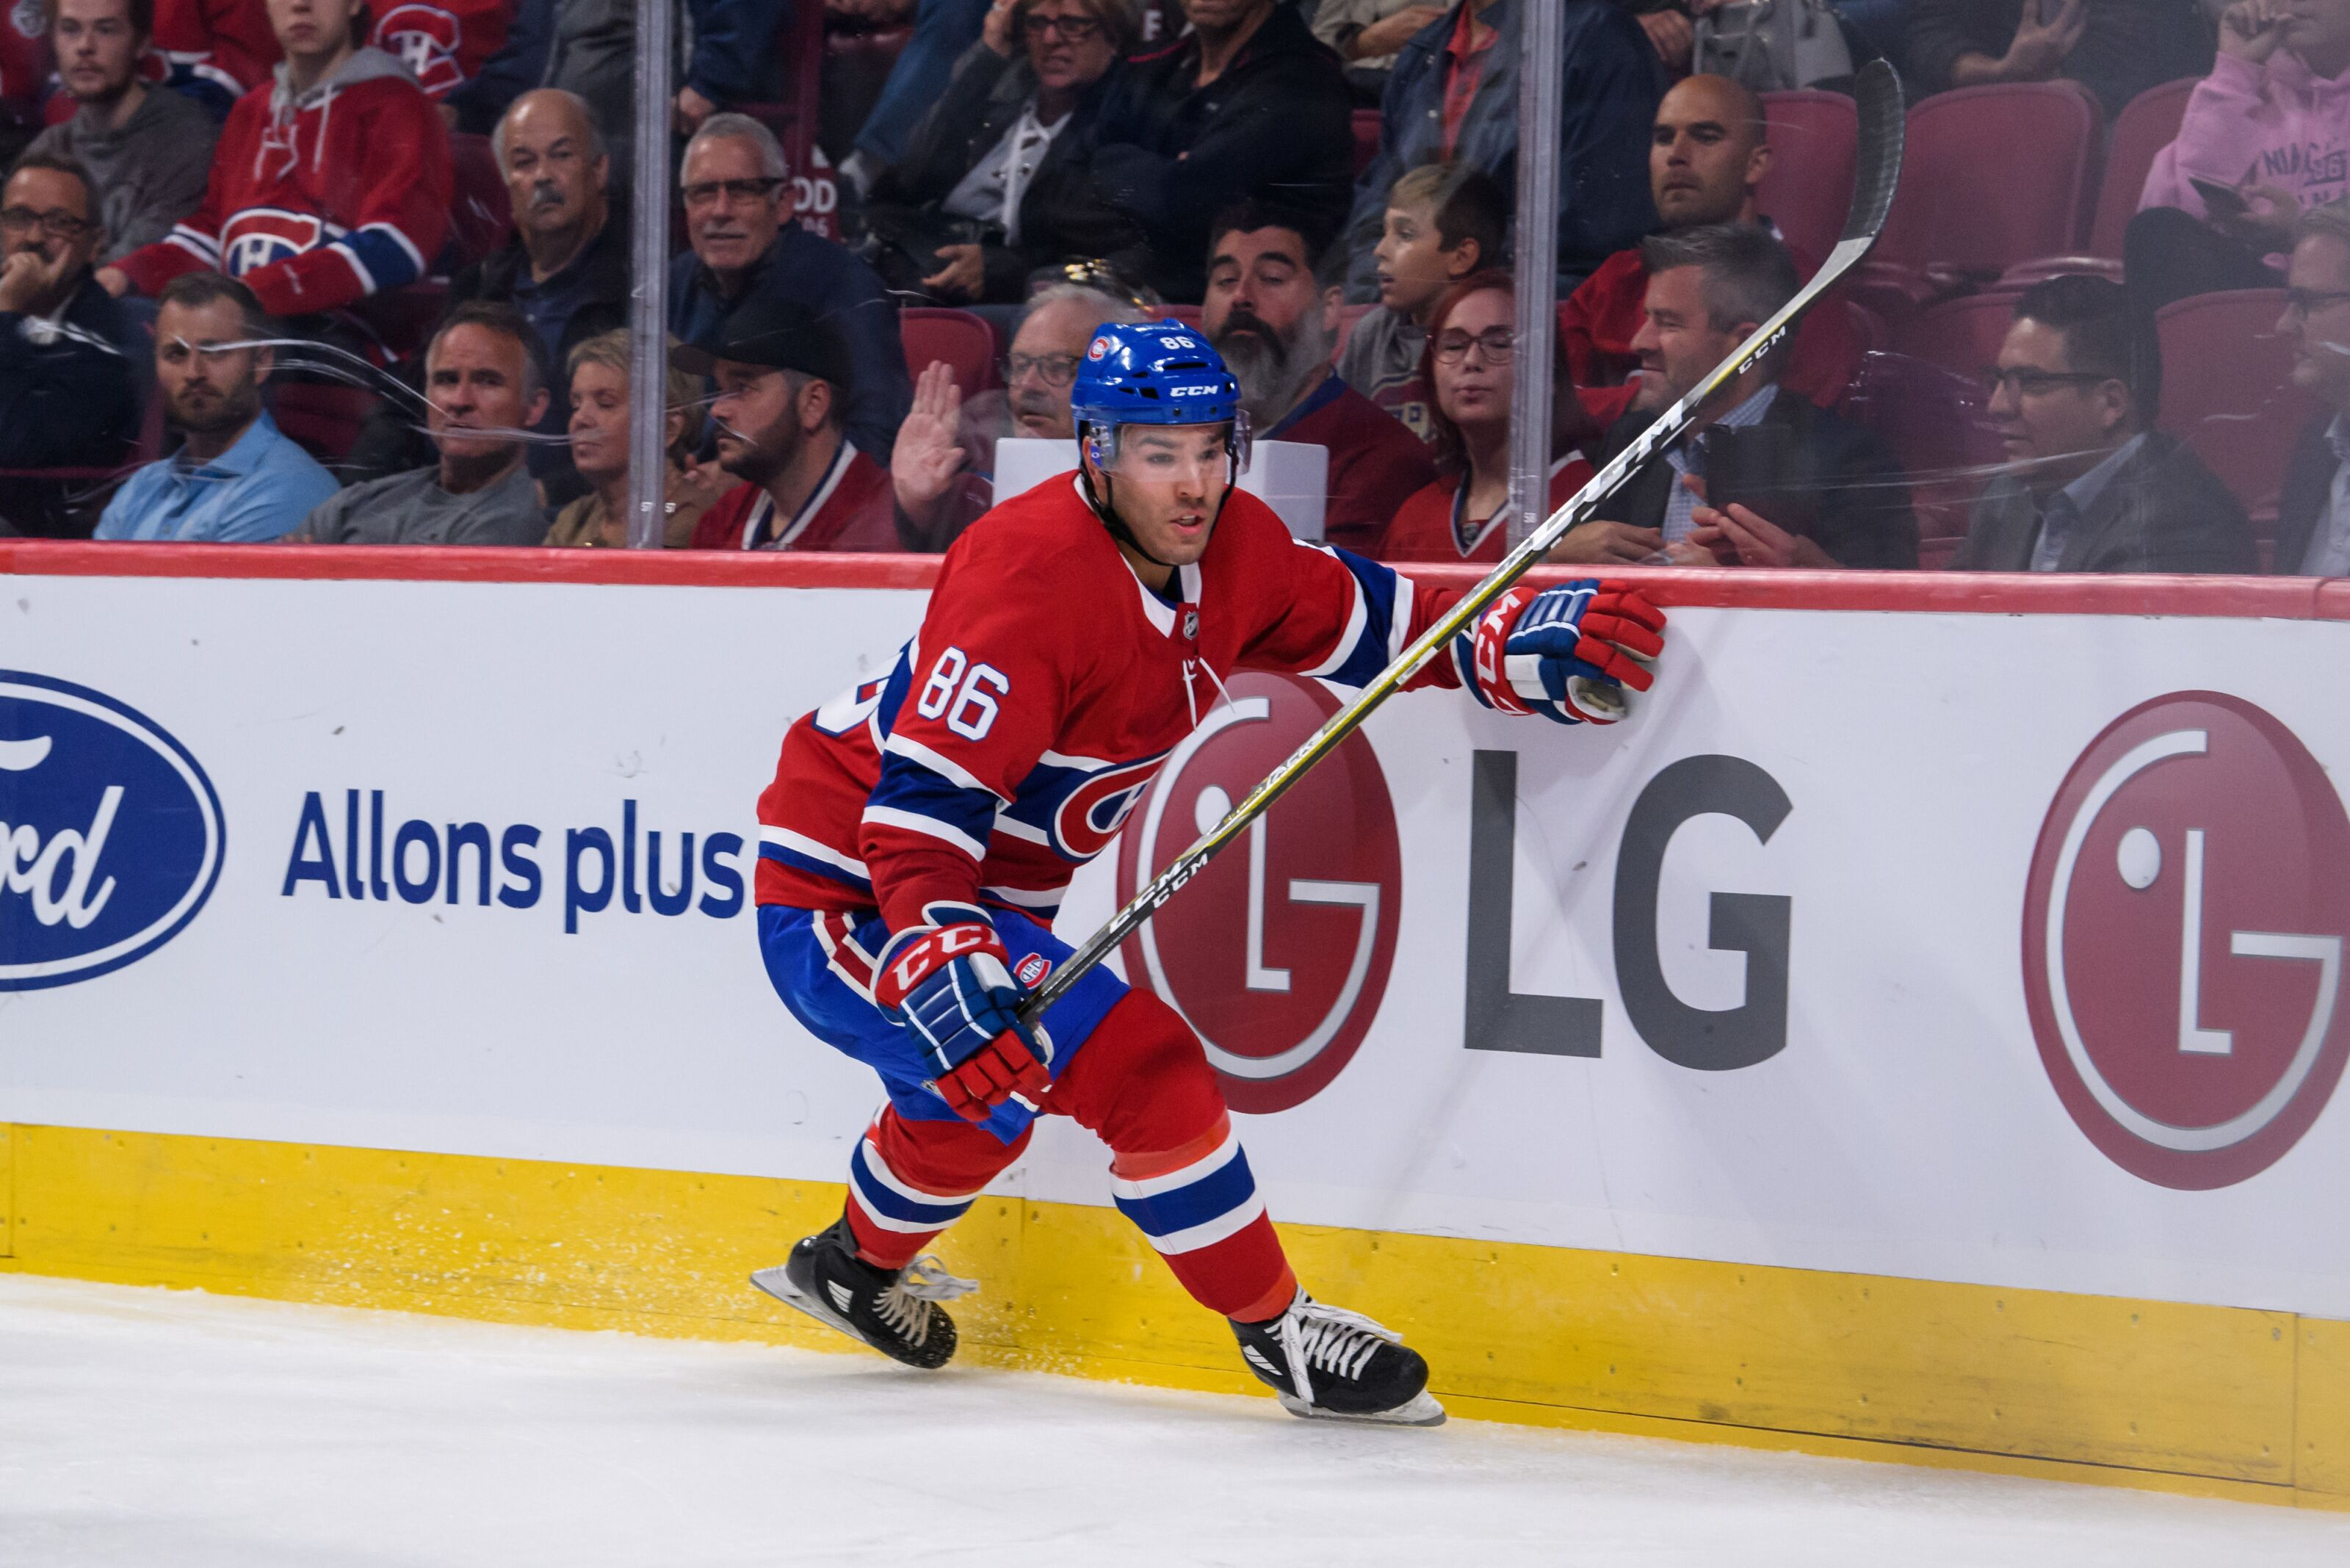 Montreal Canadiens Jou00ebl Teasdale advances to the Memorial Cup Final